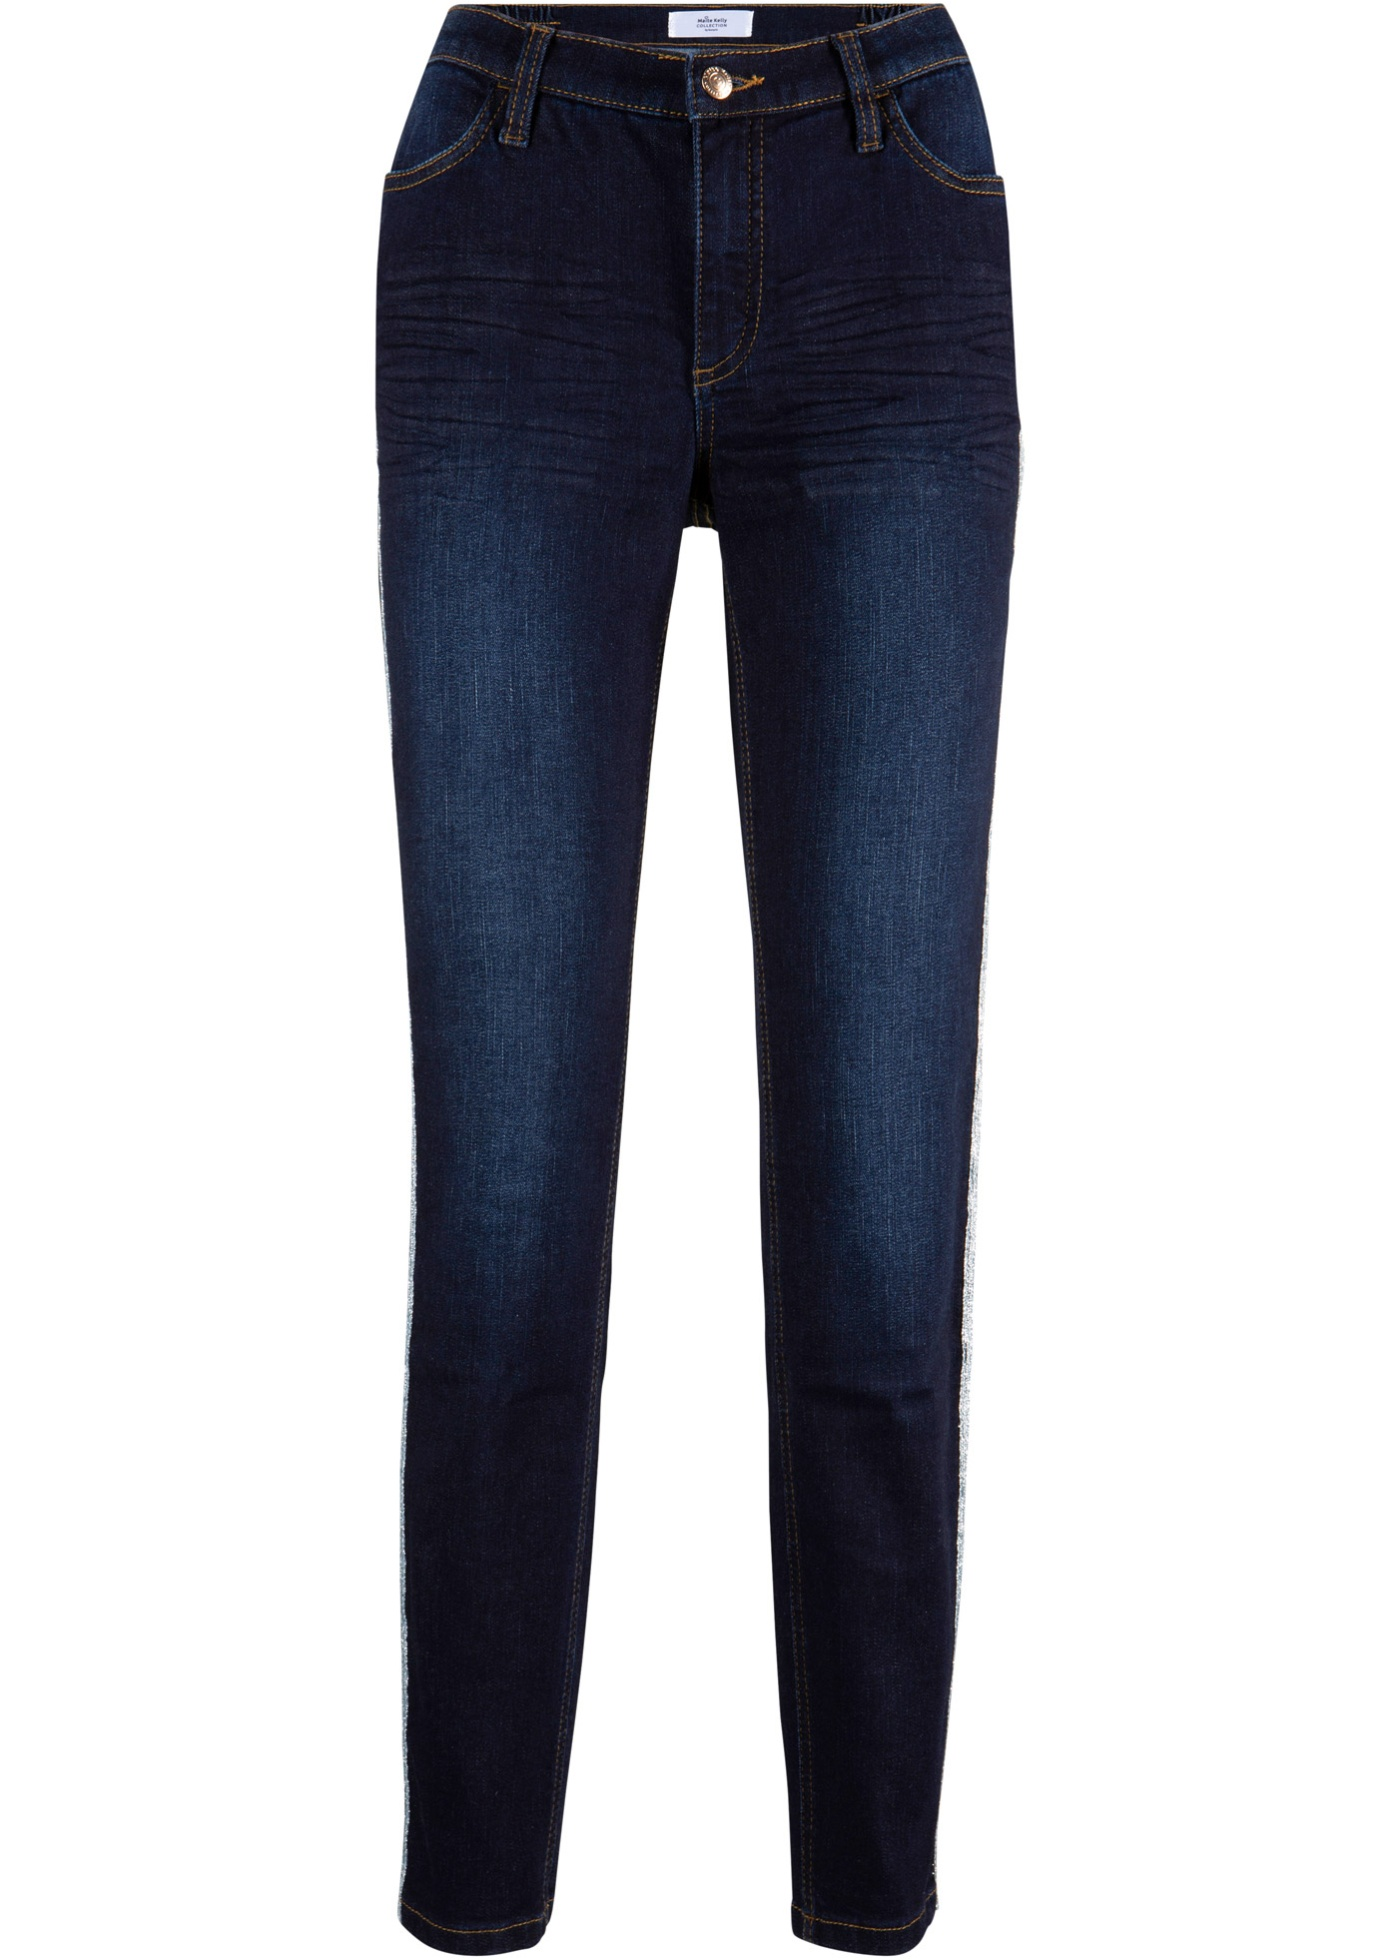 Maite Kelly Stretch - Jeans